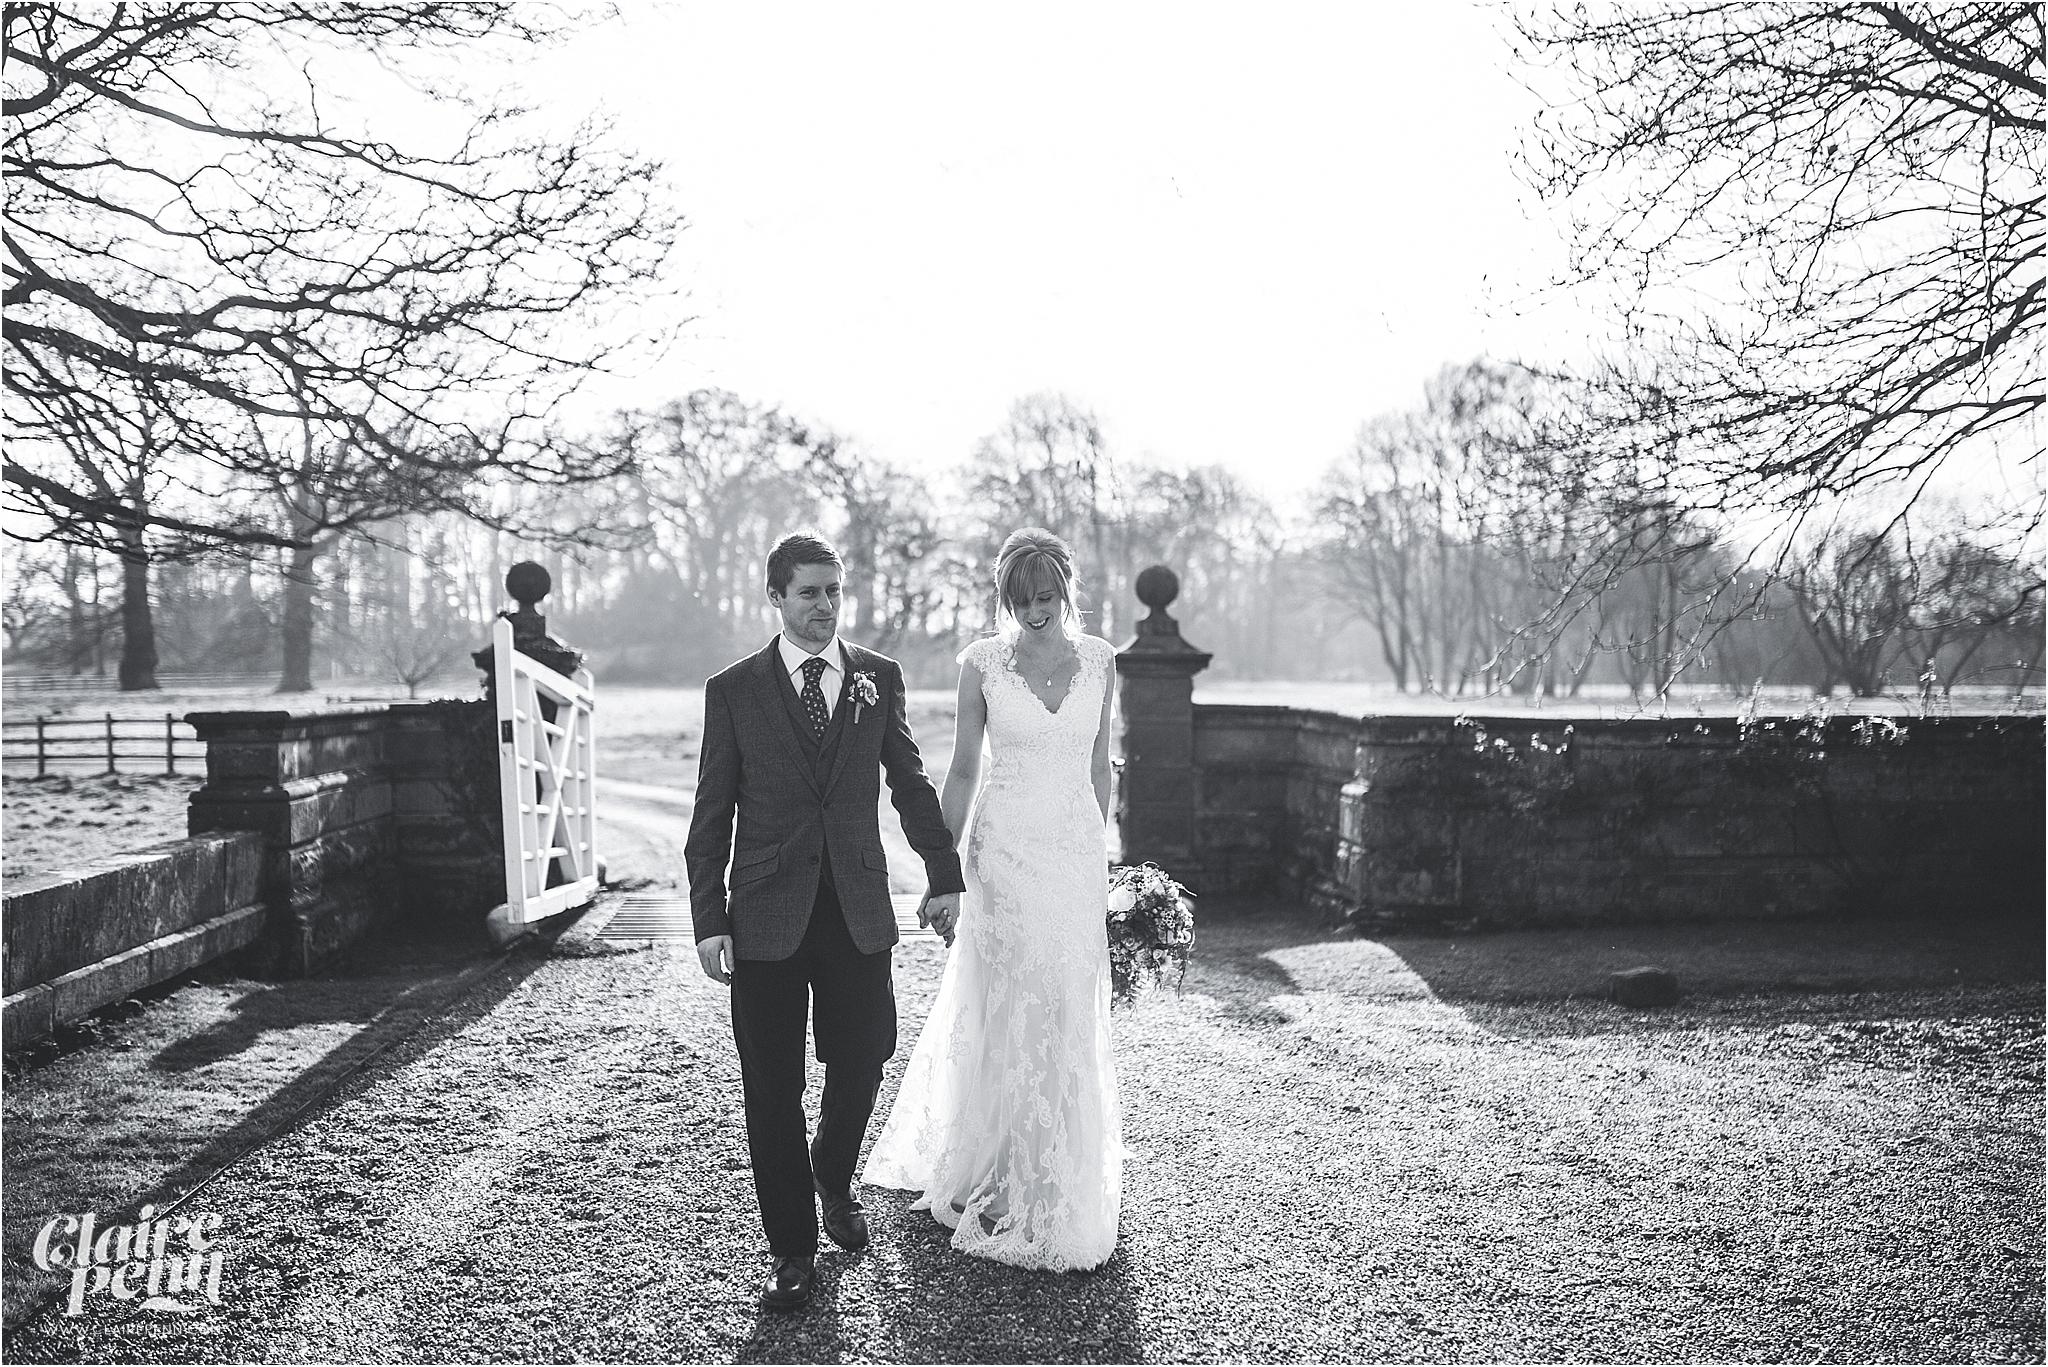 Iscoyd Park wedding, Whitchurch, Cheshire wedding photographer_0040.jpg